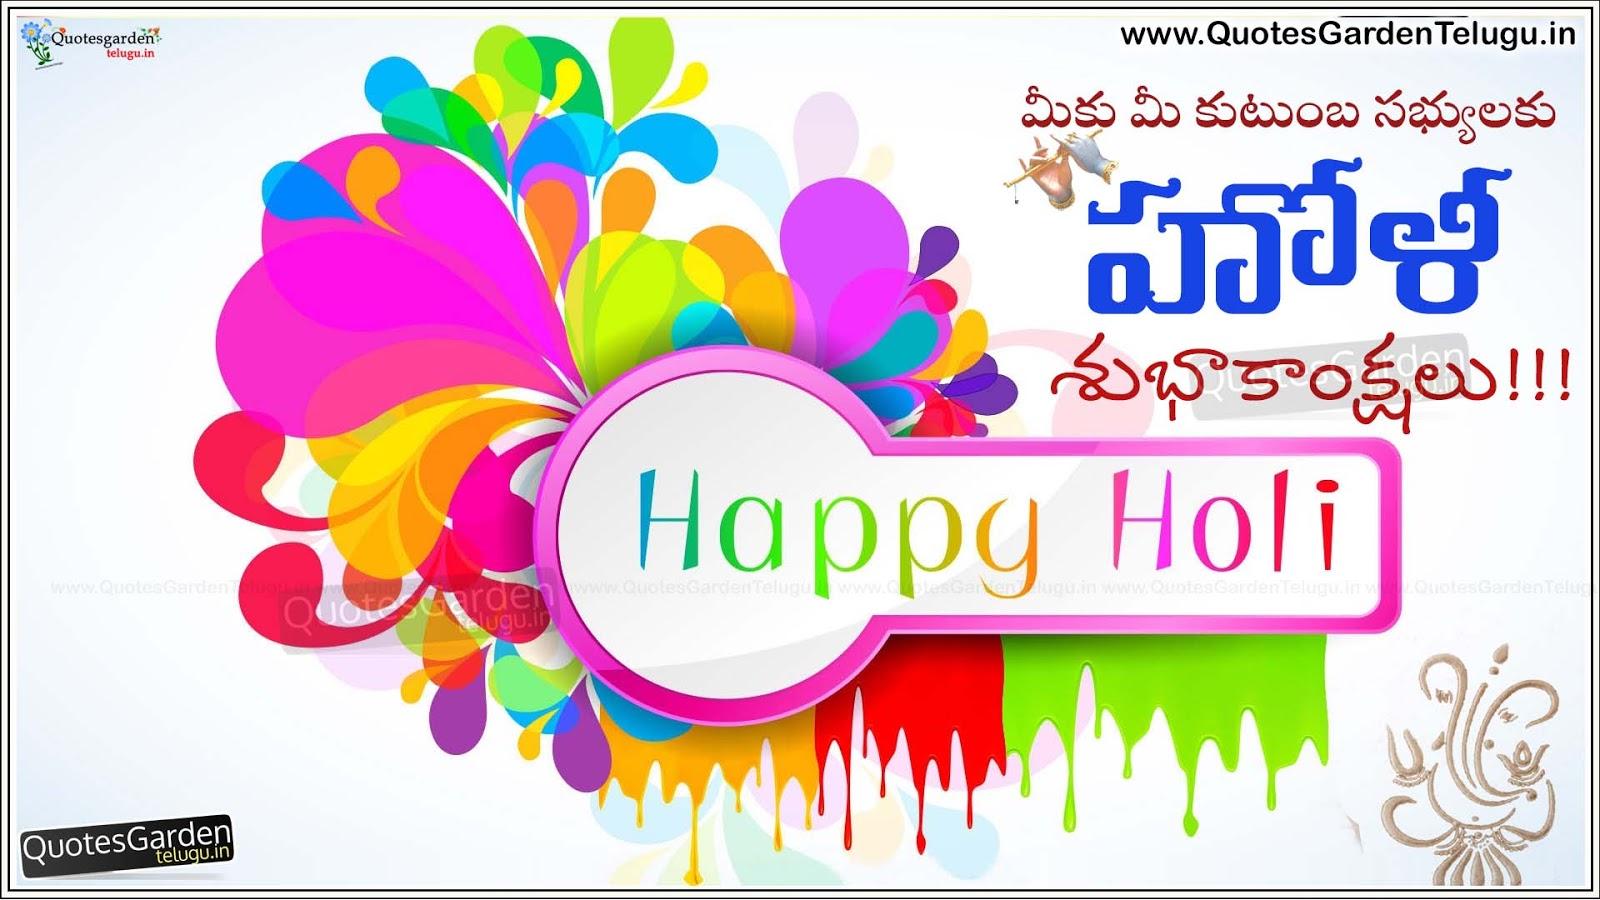 Top holi greetings hdwallpapers in telugu telugu holi panduga holi festival new greetings in telugu language latest 2017 holi telugu quotes images new m4hsunfo